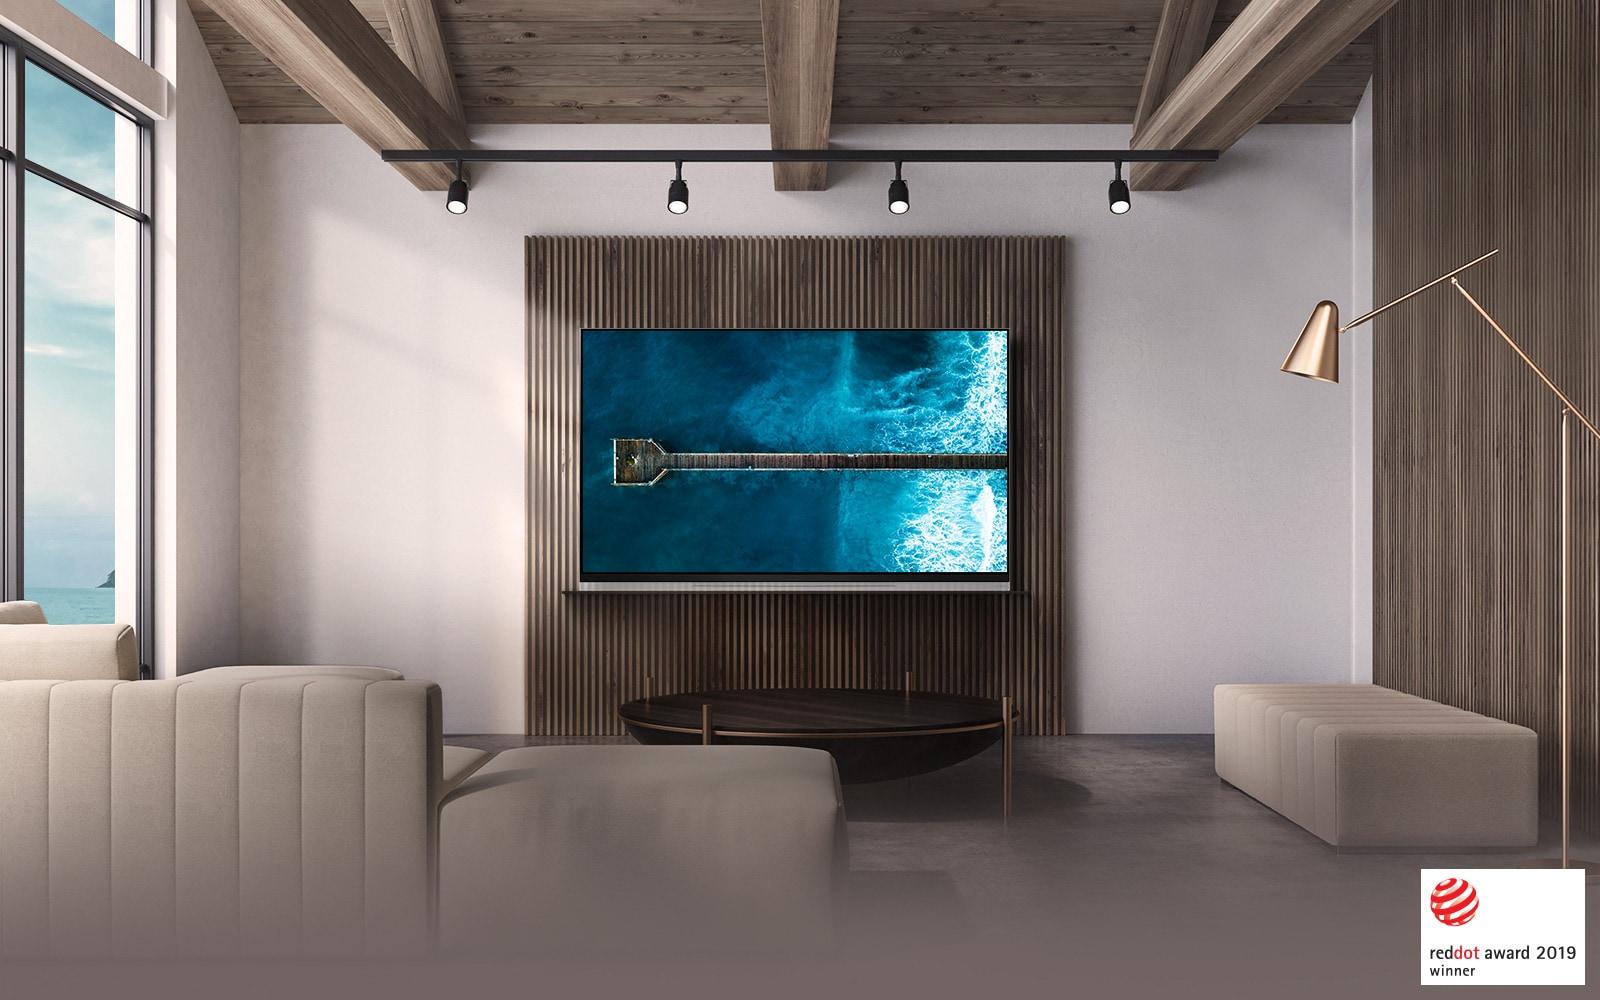 TV-OLED-E9-06-Design-Desktop